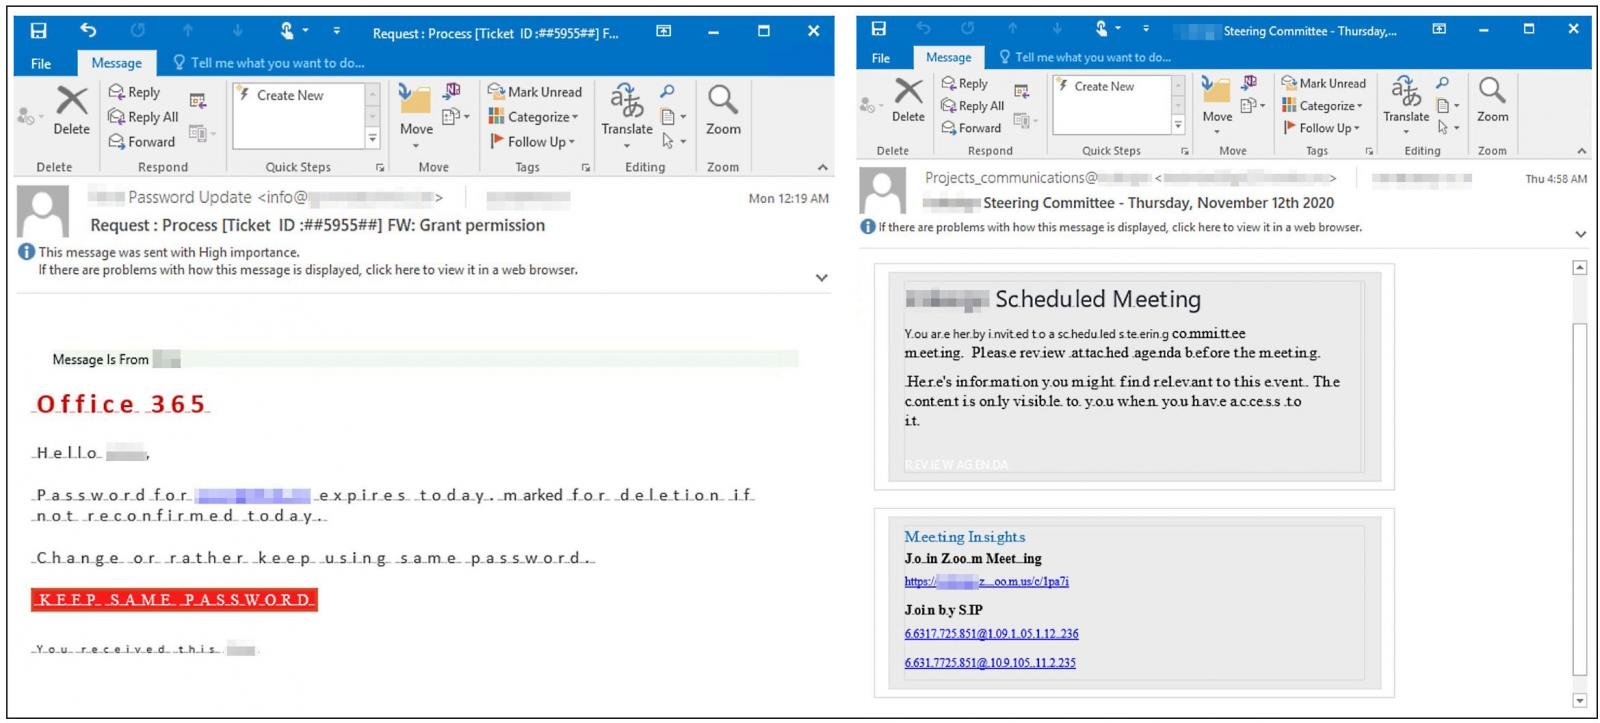 www.bleepstatic.comimagesnewsu11092922020Phishing email samples(1)